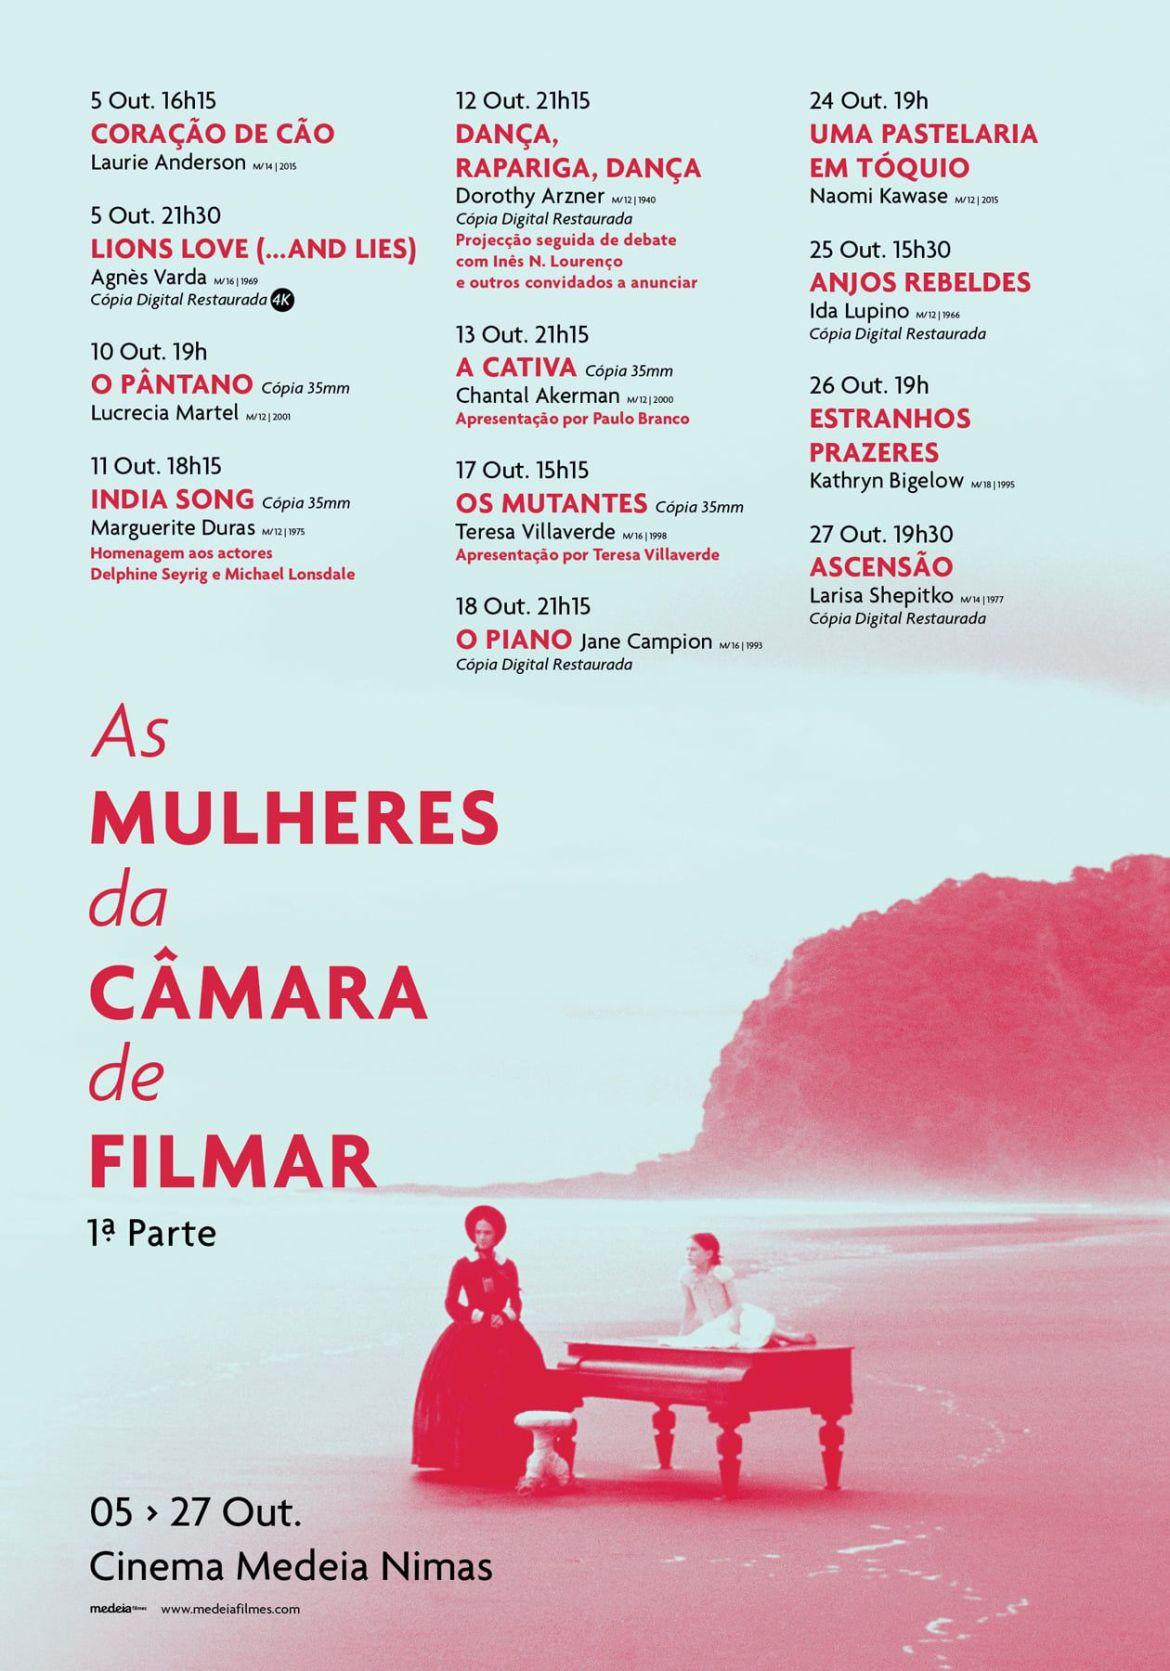 Medeia-Filmes-Mulheres-Camara-Filmar